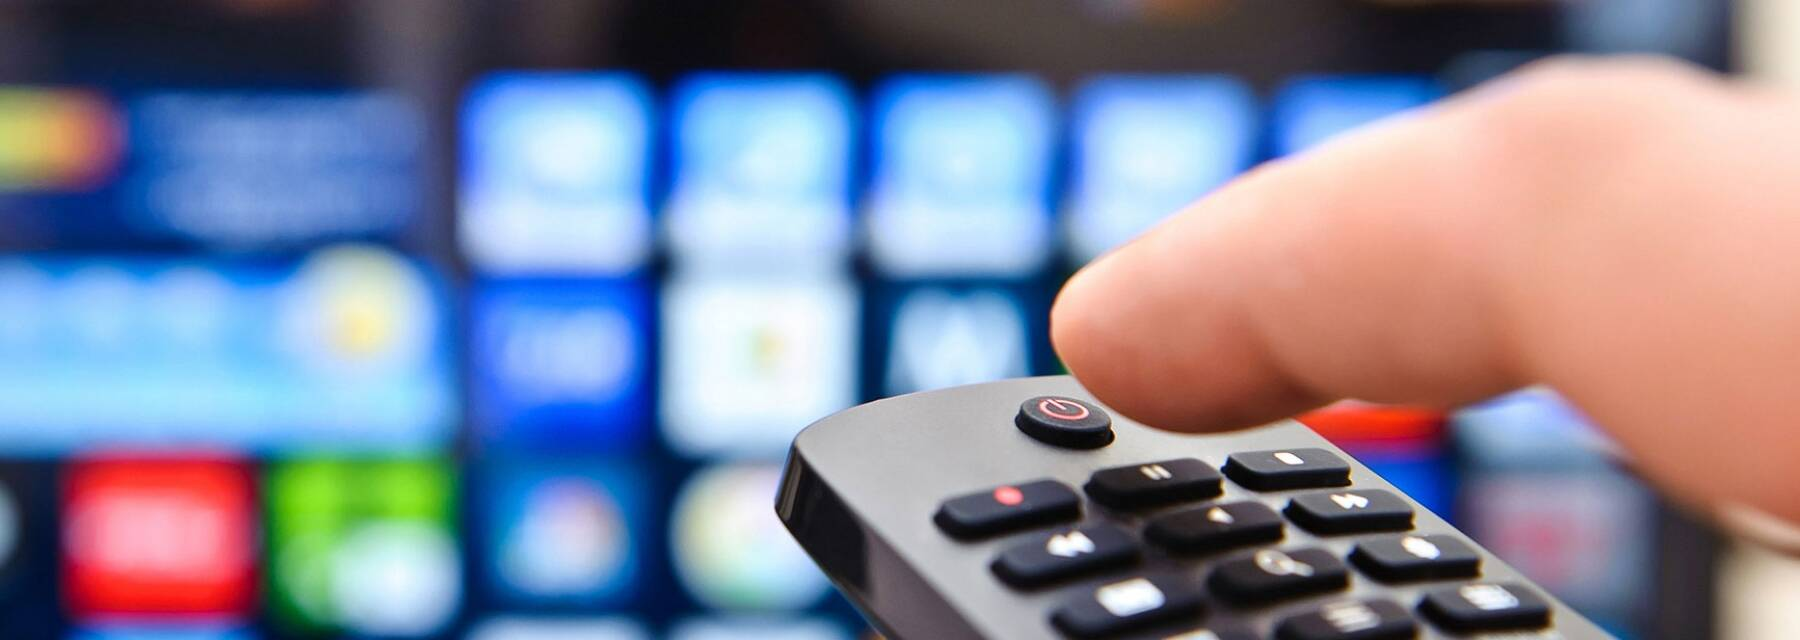 Smart-TV-App-Development-services